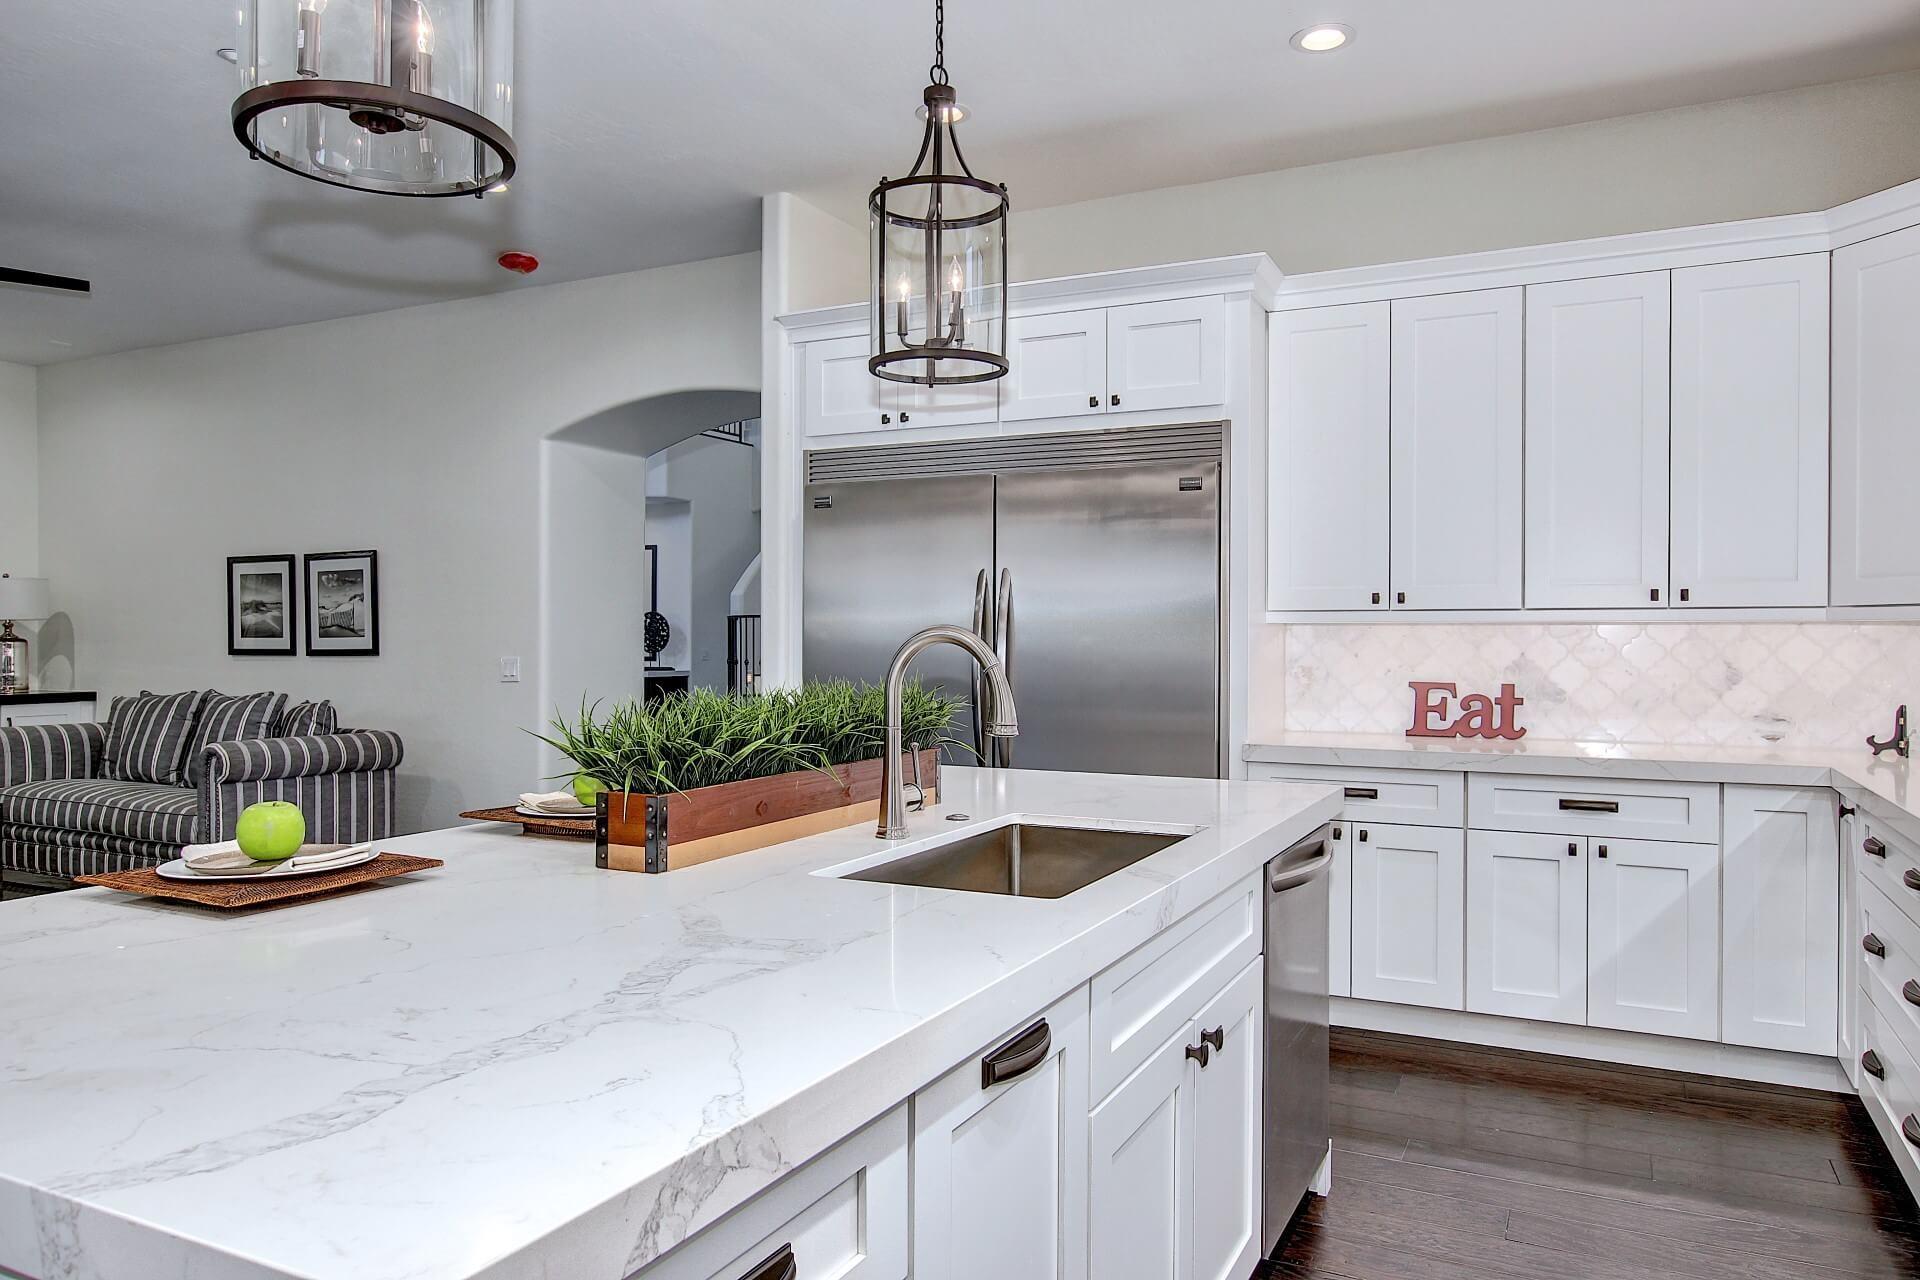 Quartz Countertops | Kitchen Cabinets & Countertops Remodeling ...